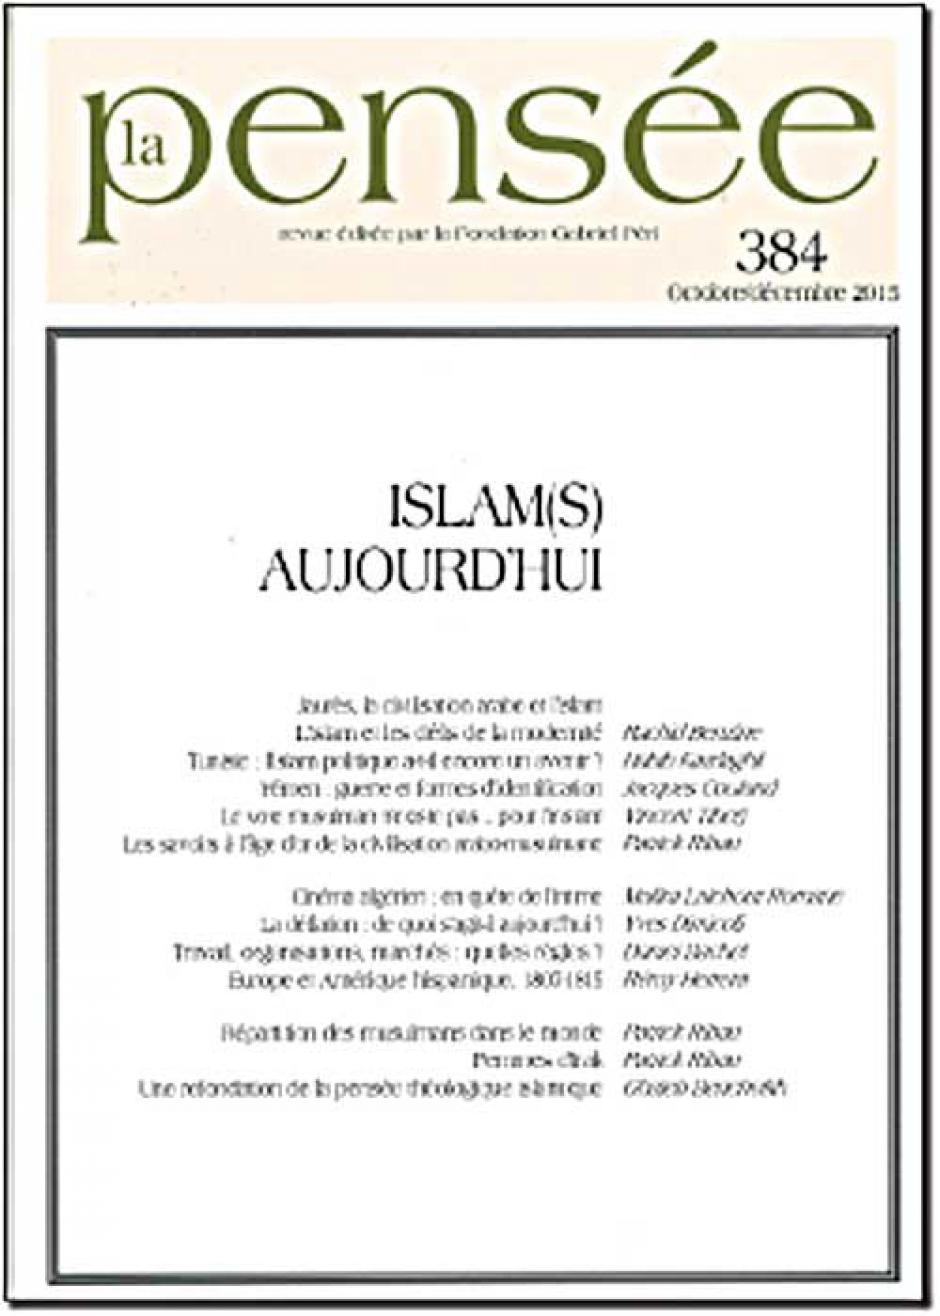 « Islam(s) aujourd'hui »